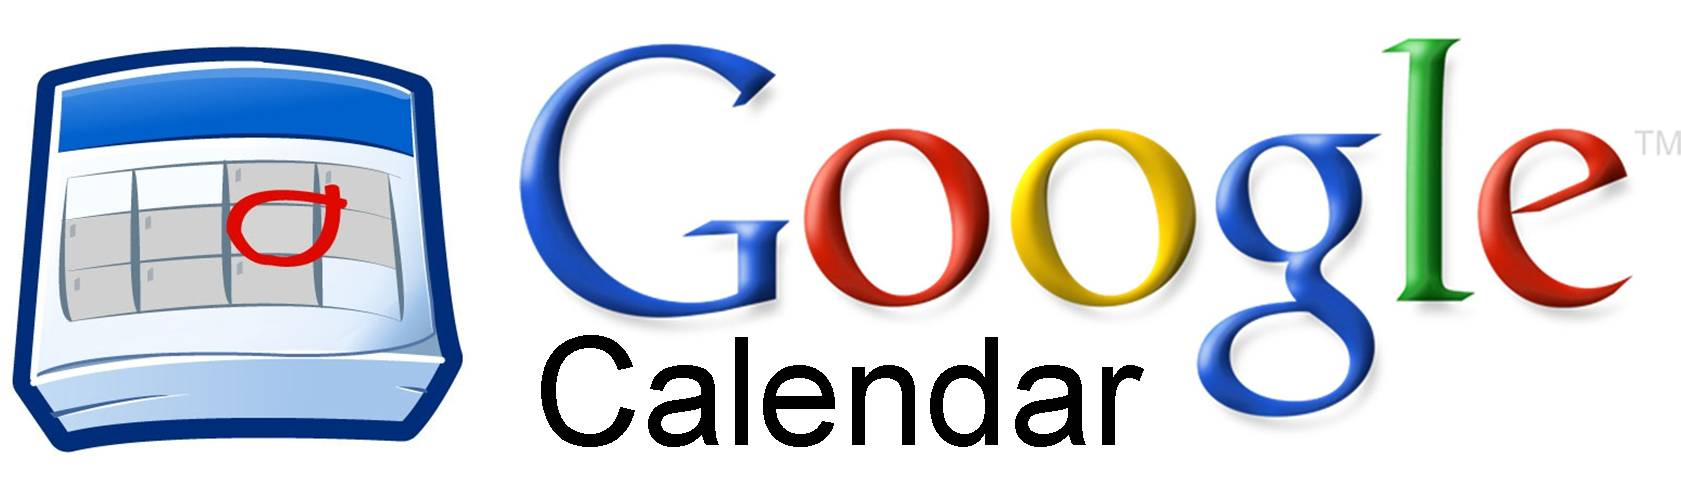 google-calendar_logo[1]